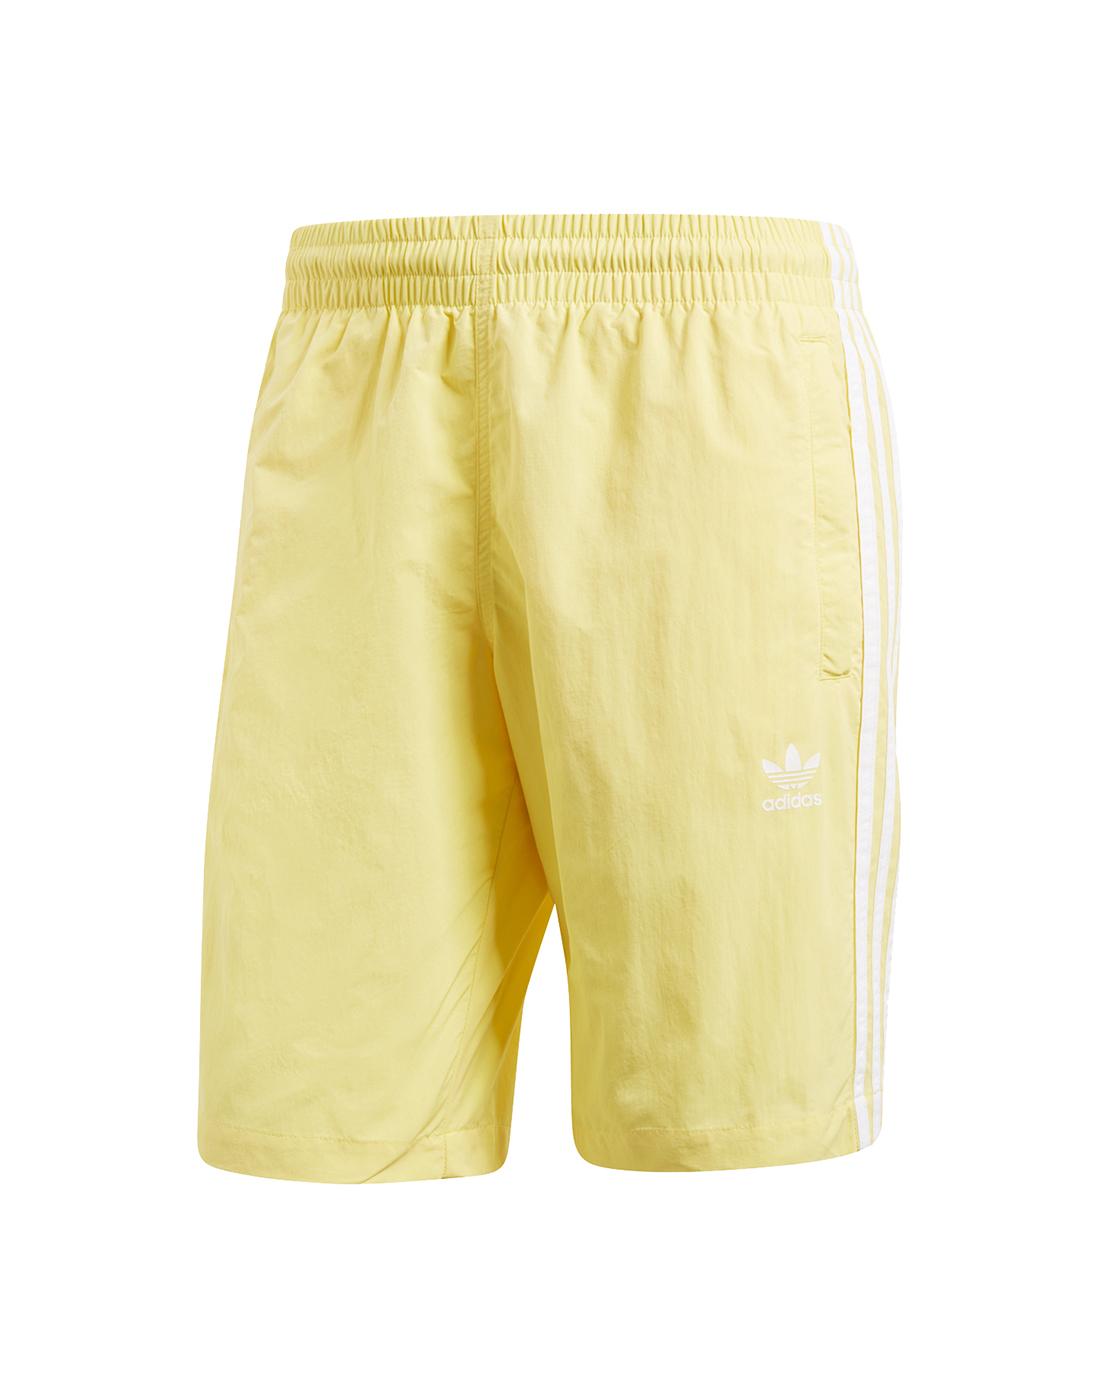 e932391ed8 Men's adidas Originals Yellow Swim Shorts | Life Style Sports